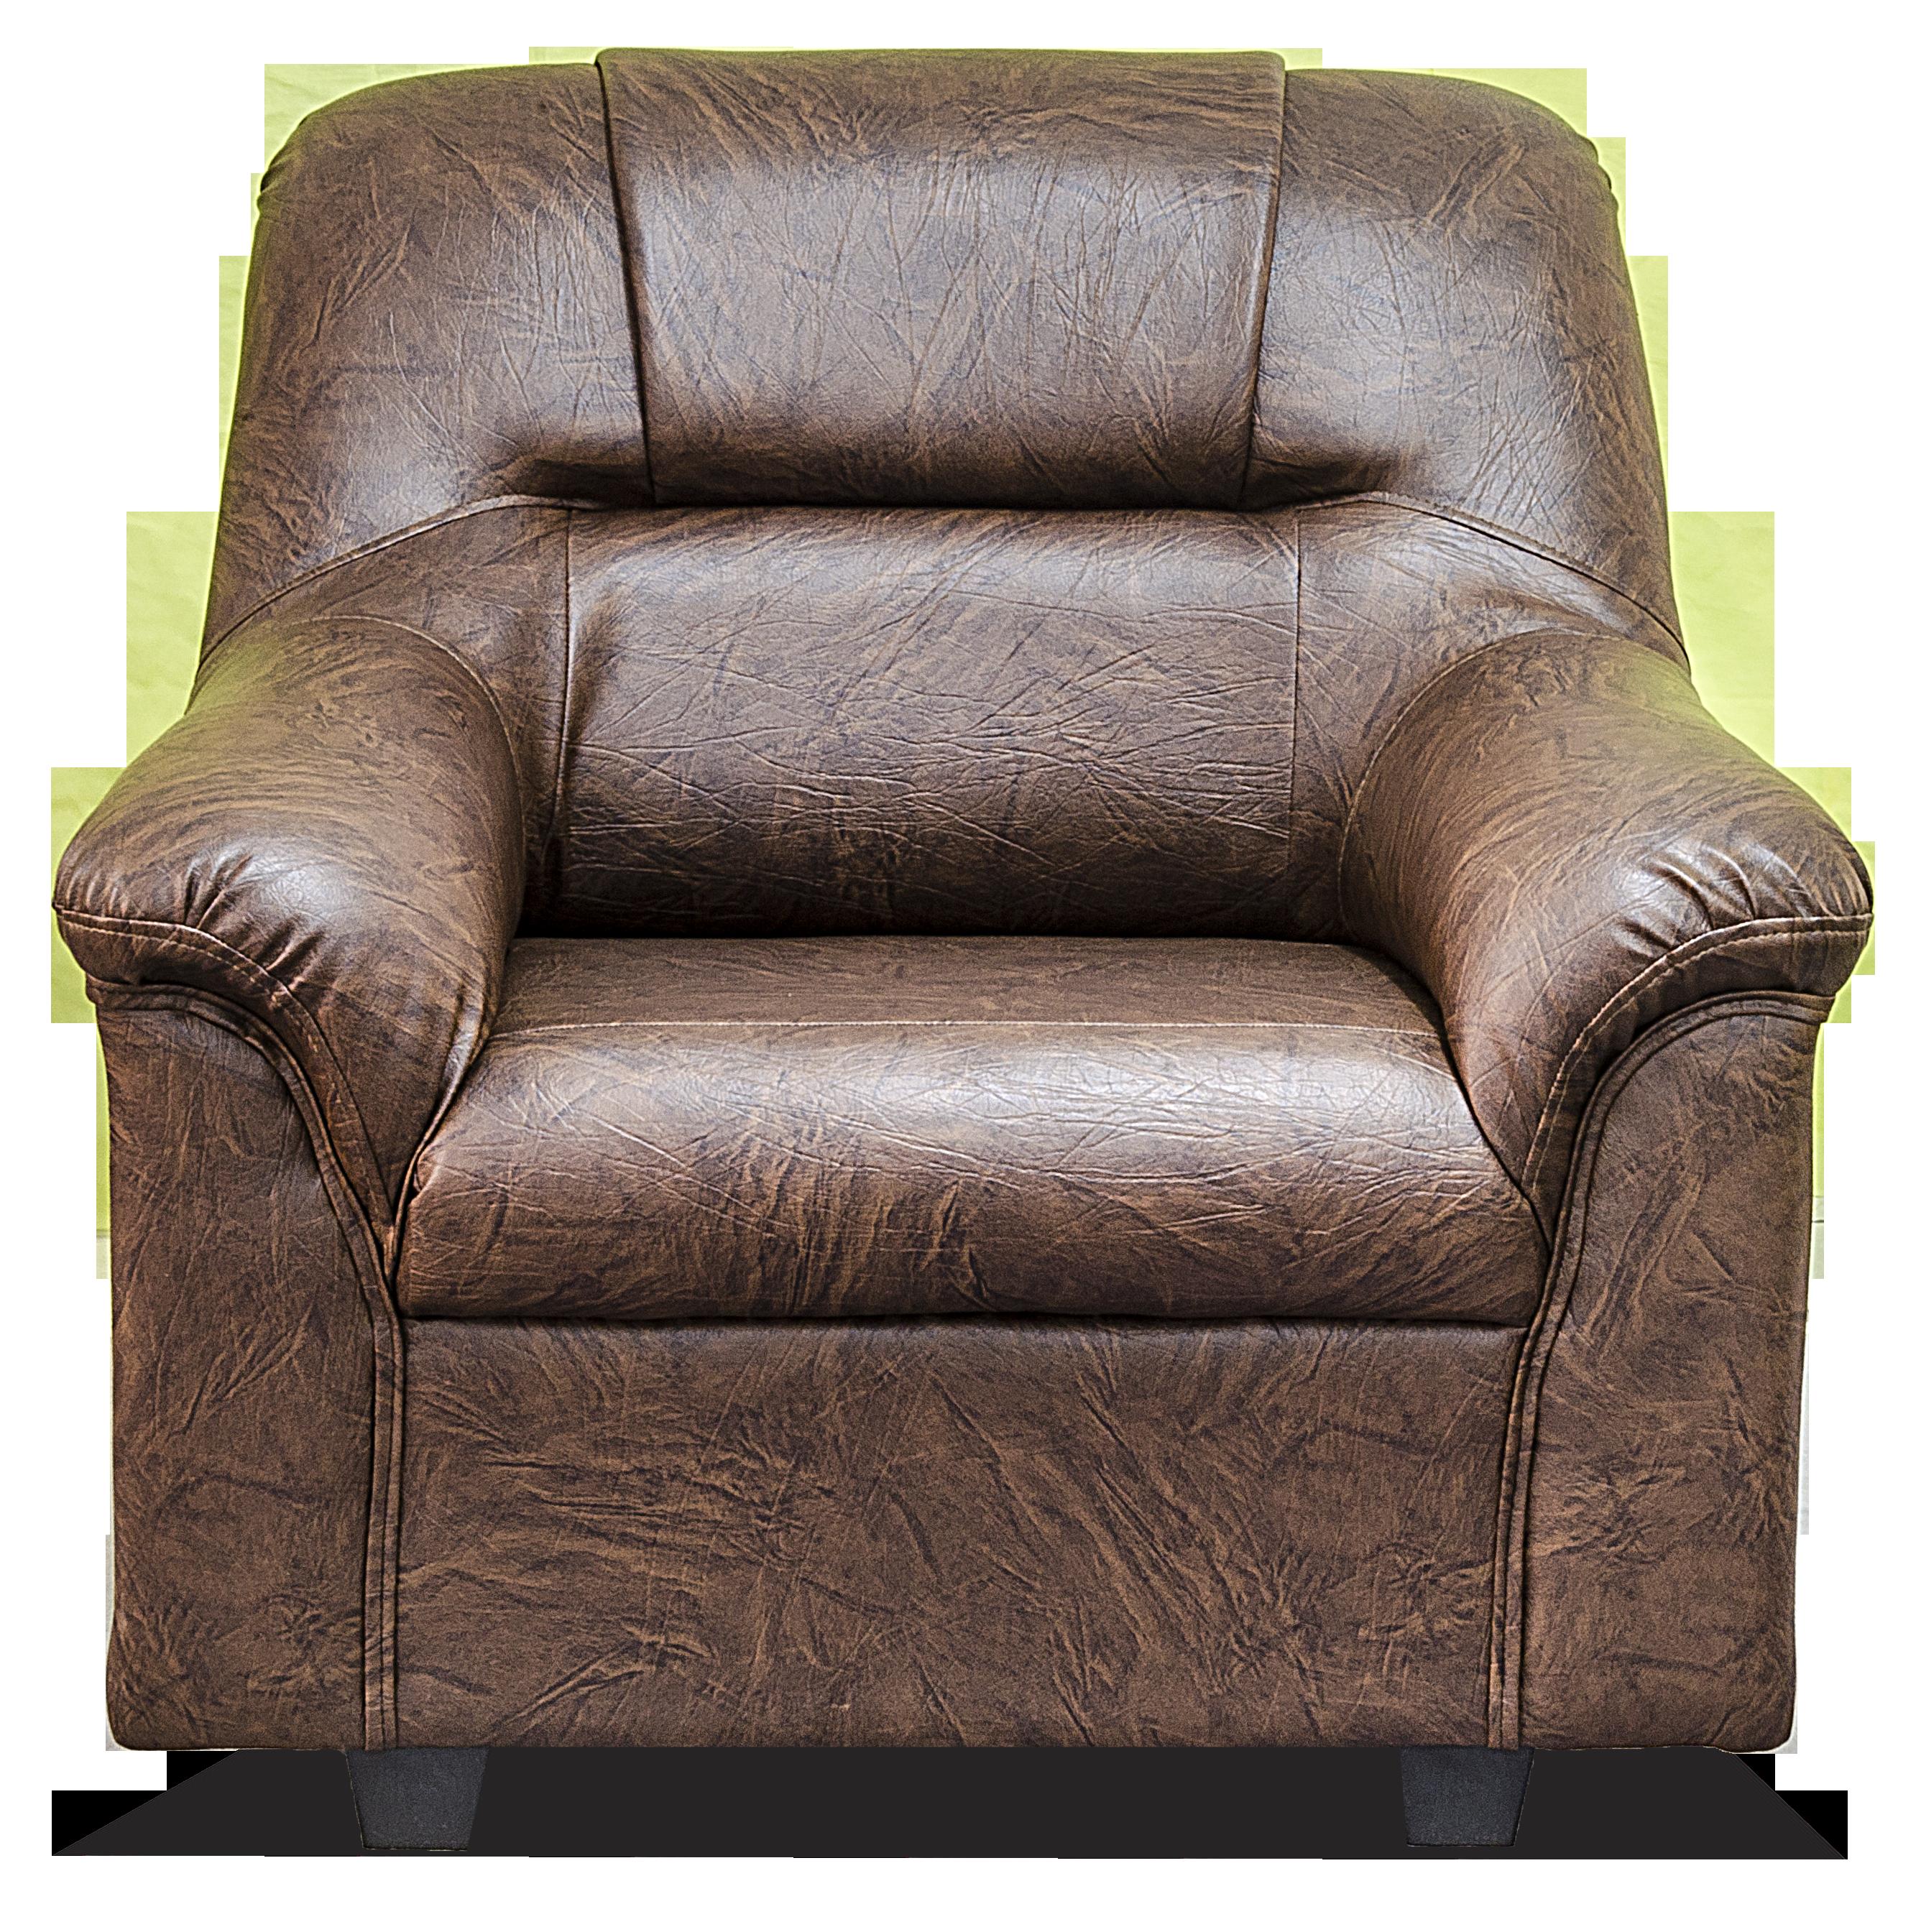 Sofa HD PNG - 118097